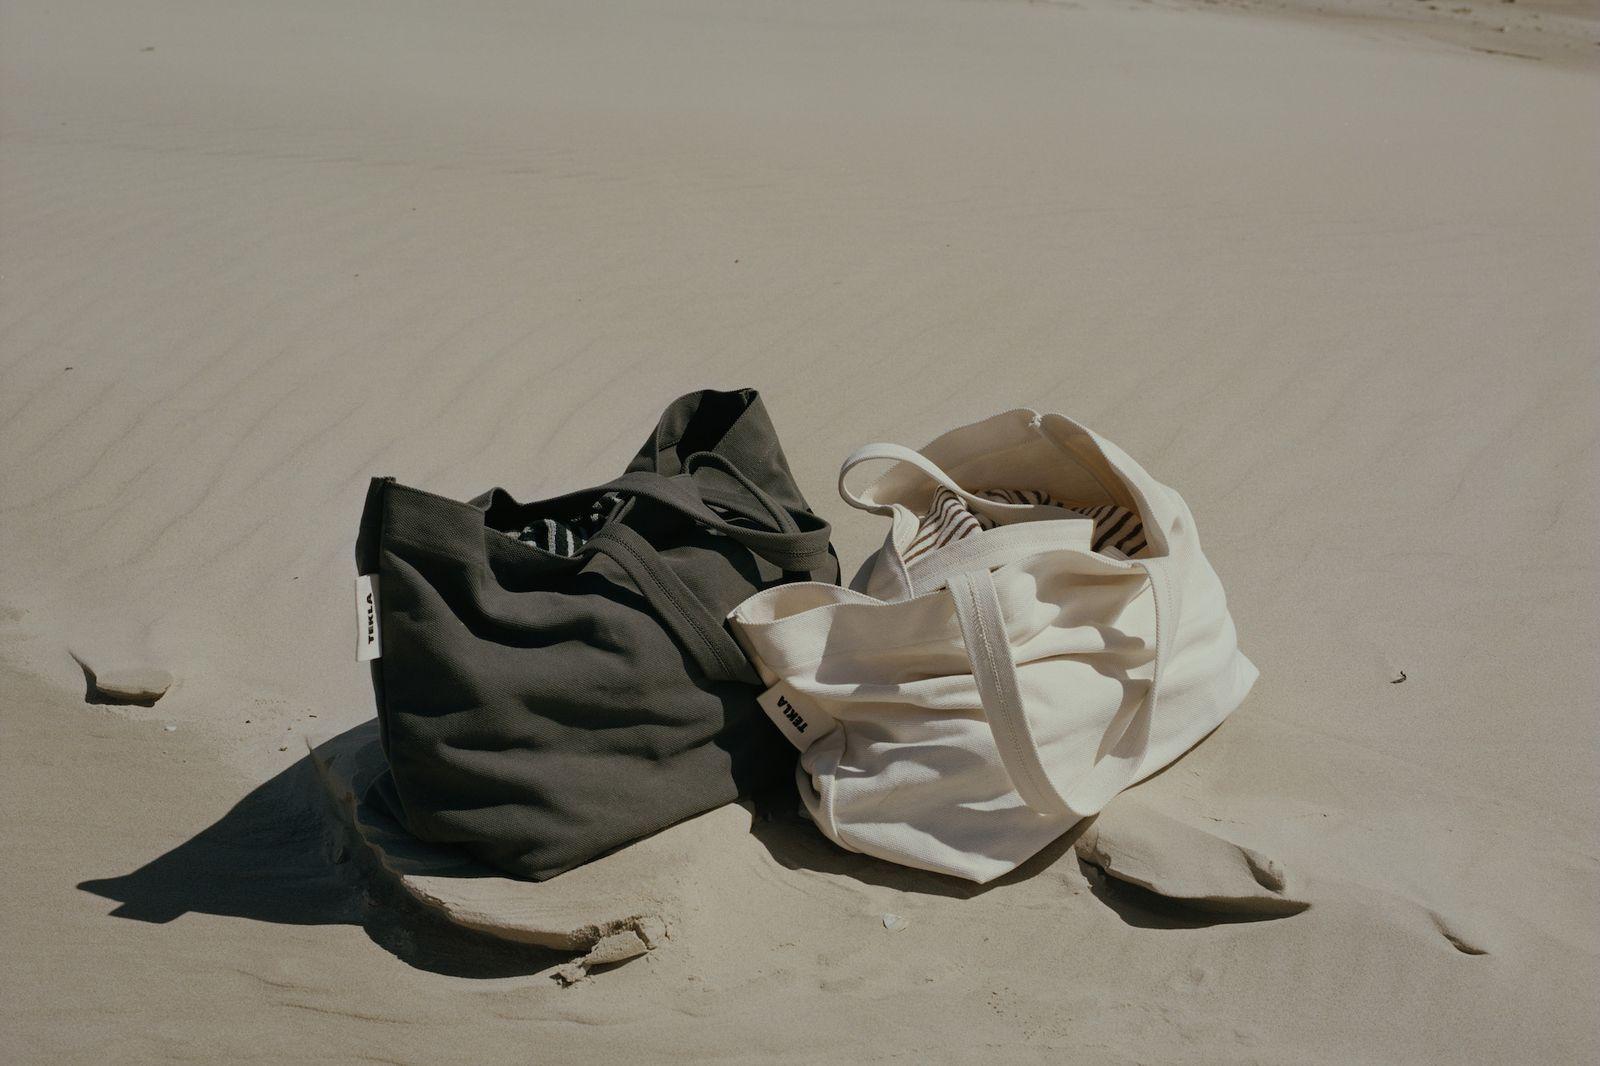 tekla-beach-capsule-collection-2